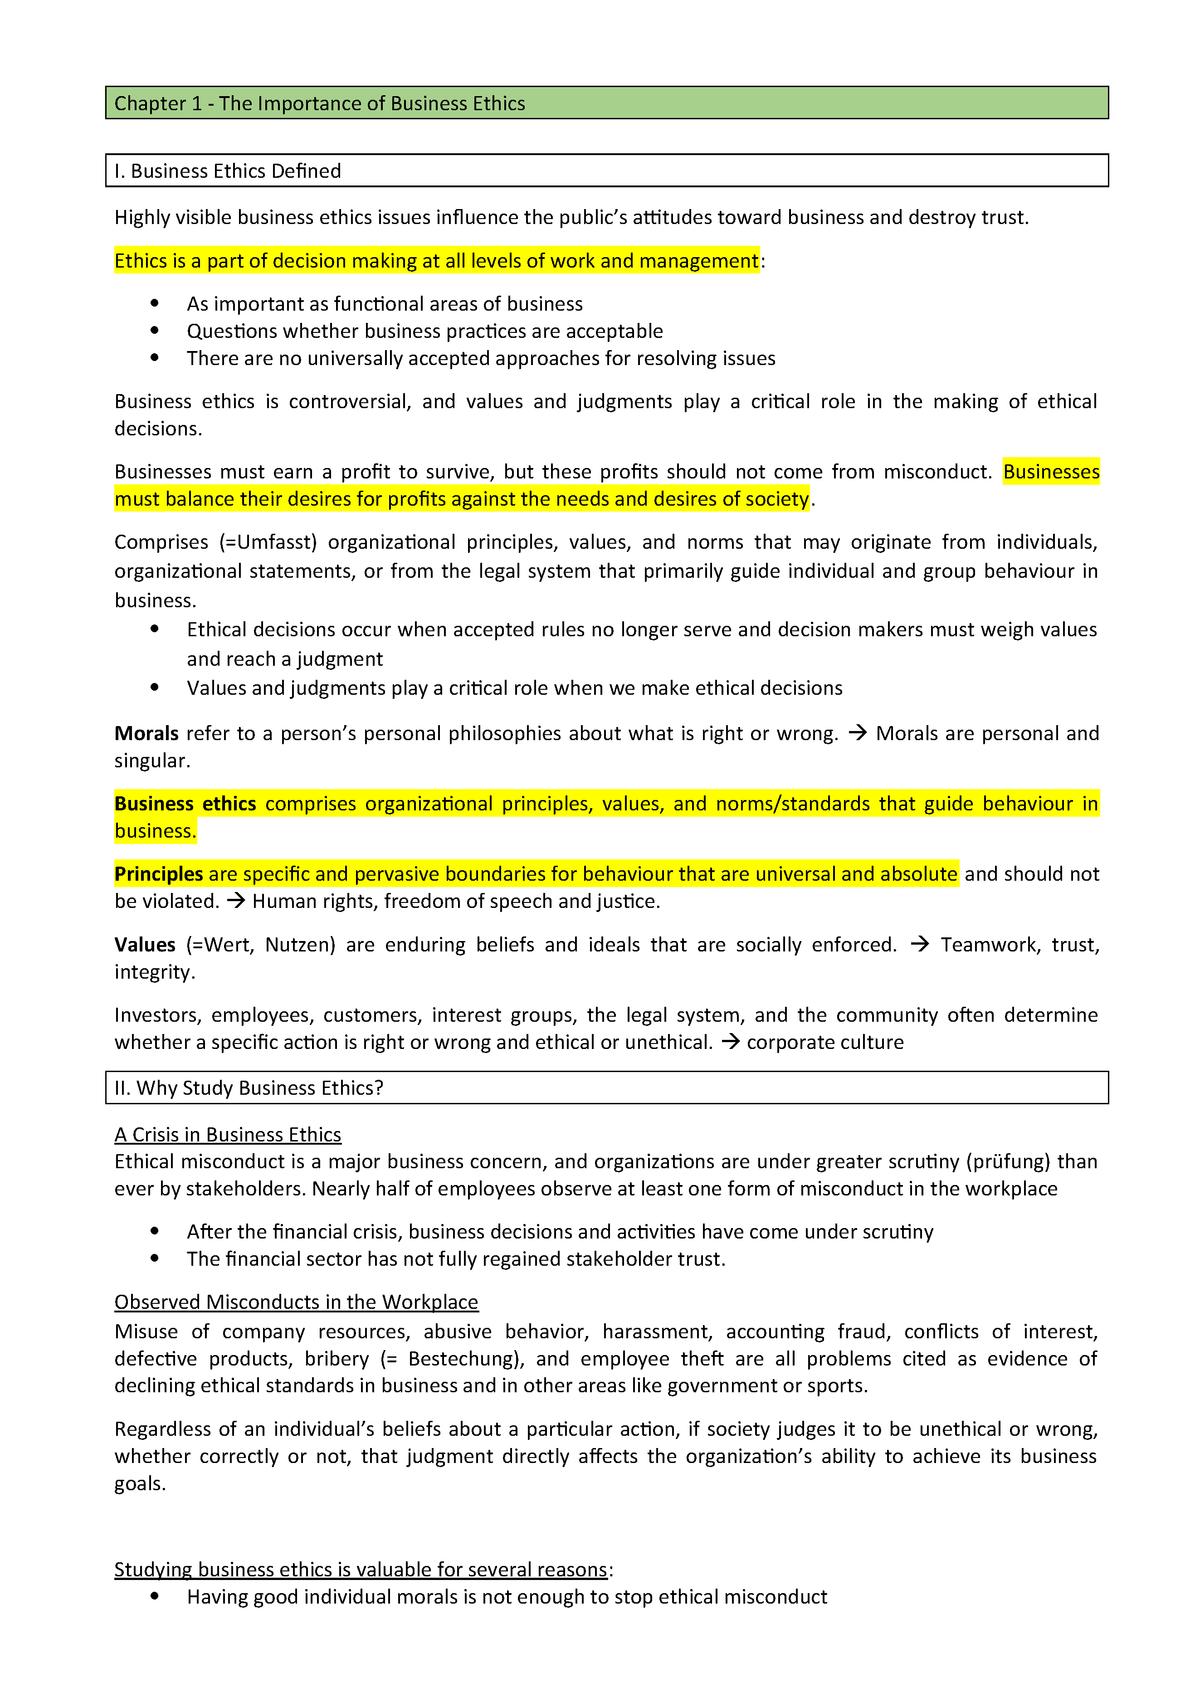 Summary Business Ethics - - FHNW - StuDocu